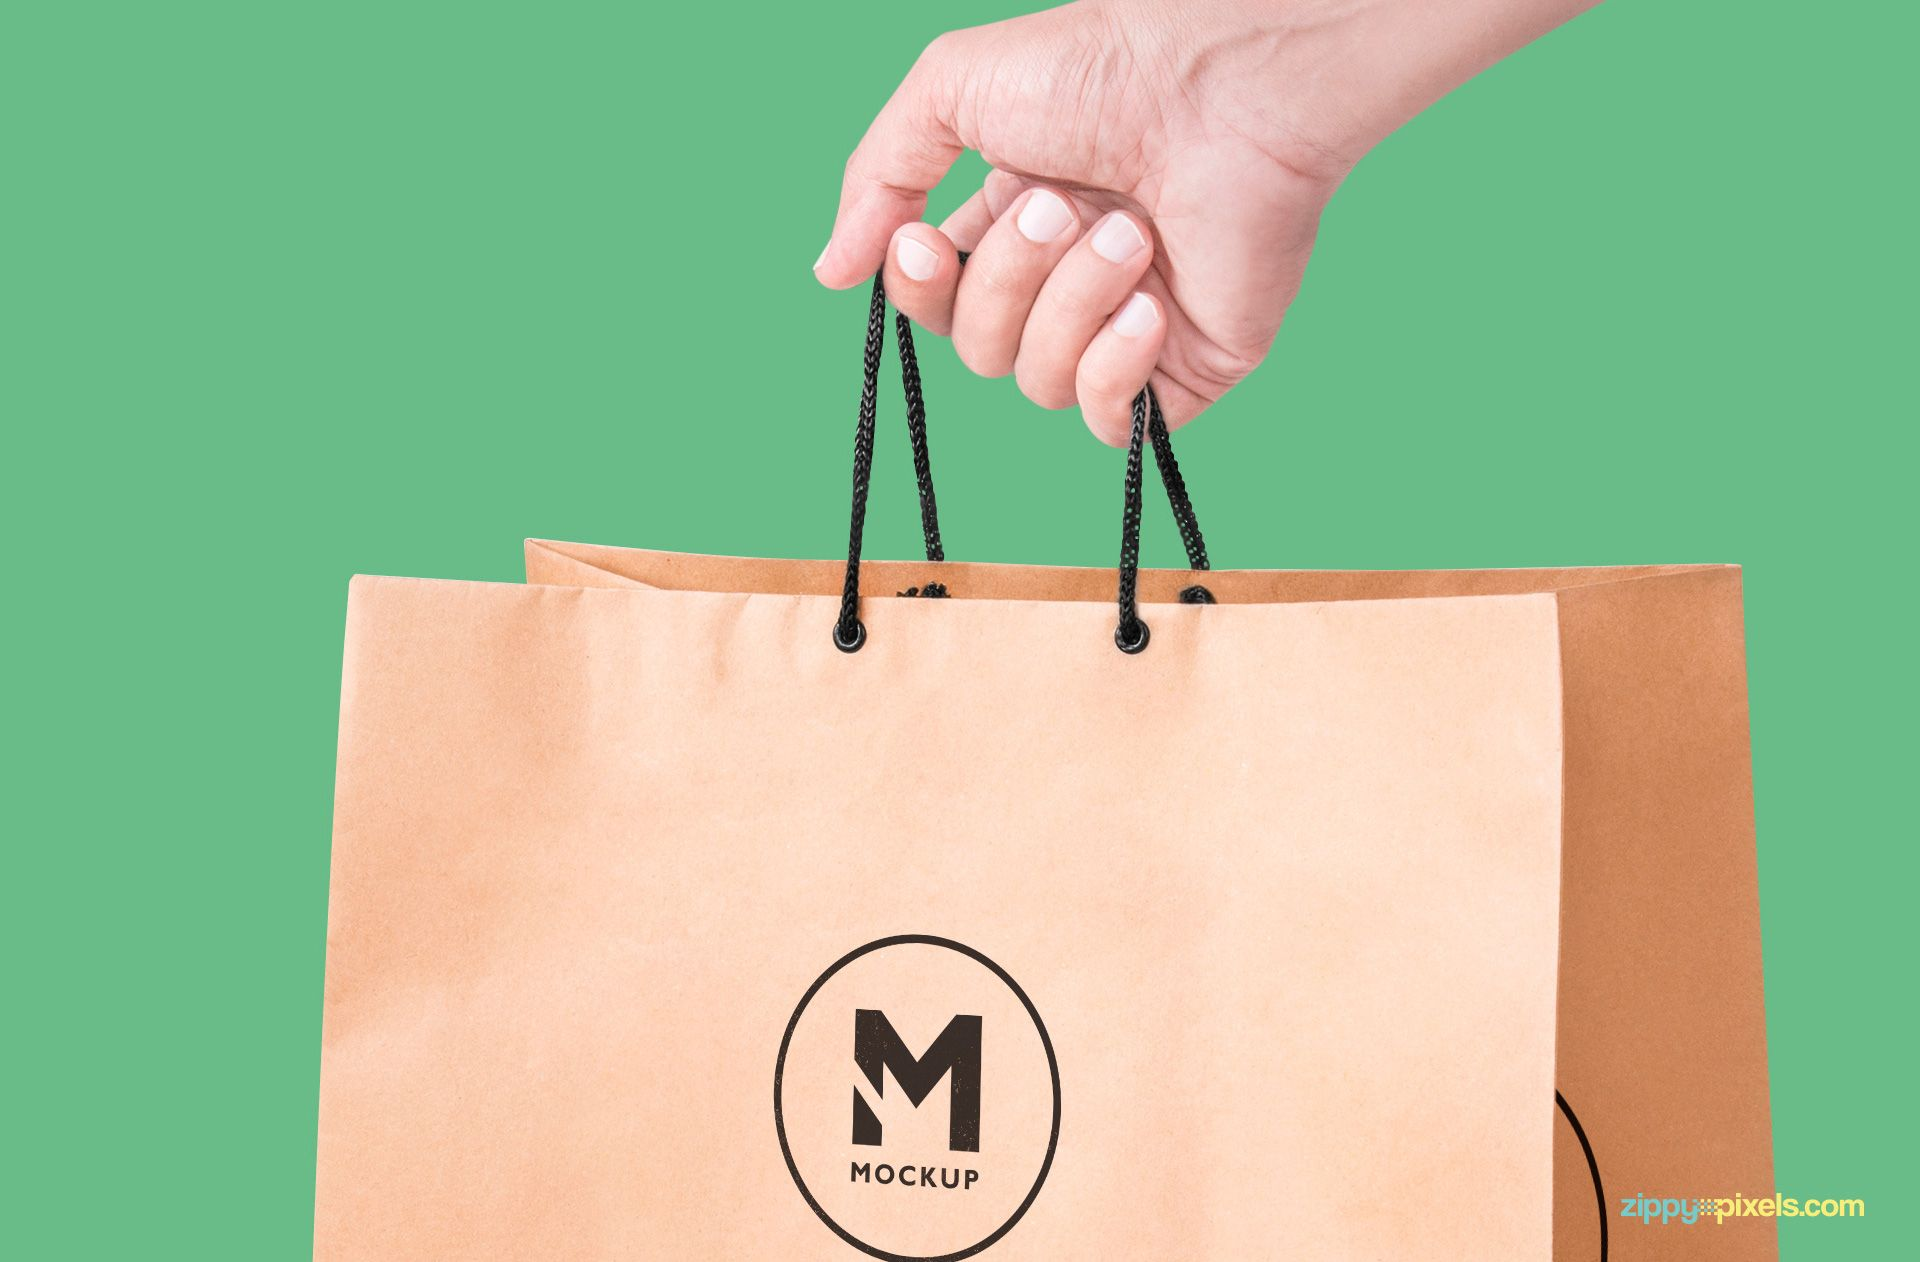 Download Paper Bag Mockup Free Psd Download Zippypixels Bag Mockup Mockup Free Psd Download Mockup Free Psd